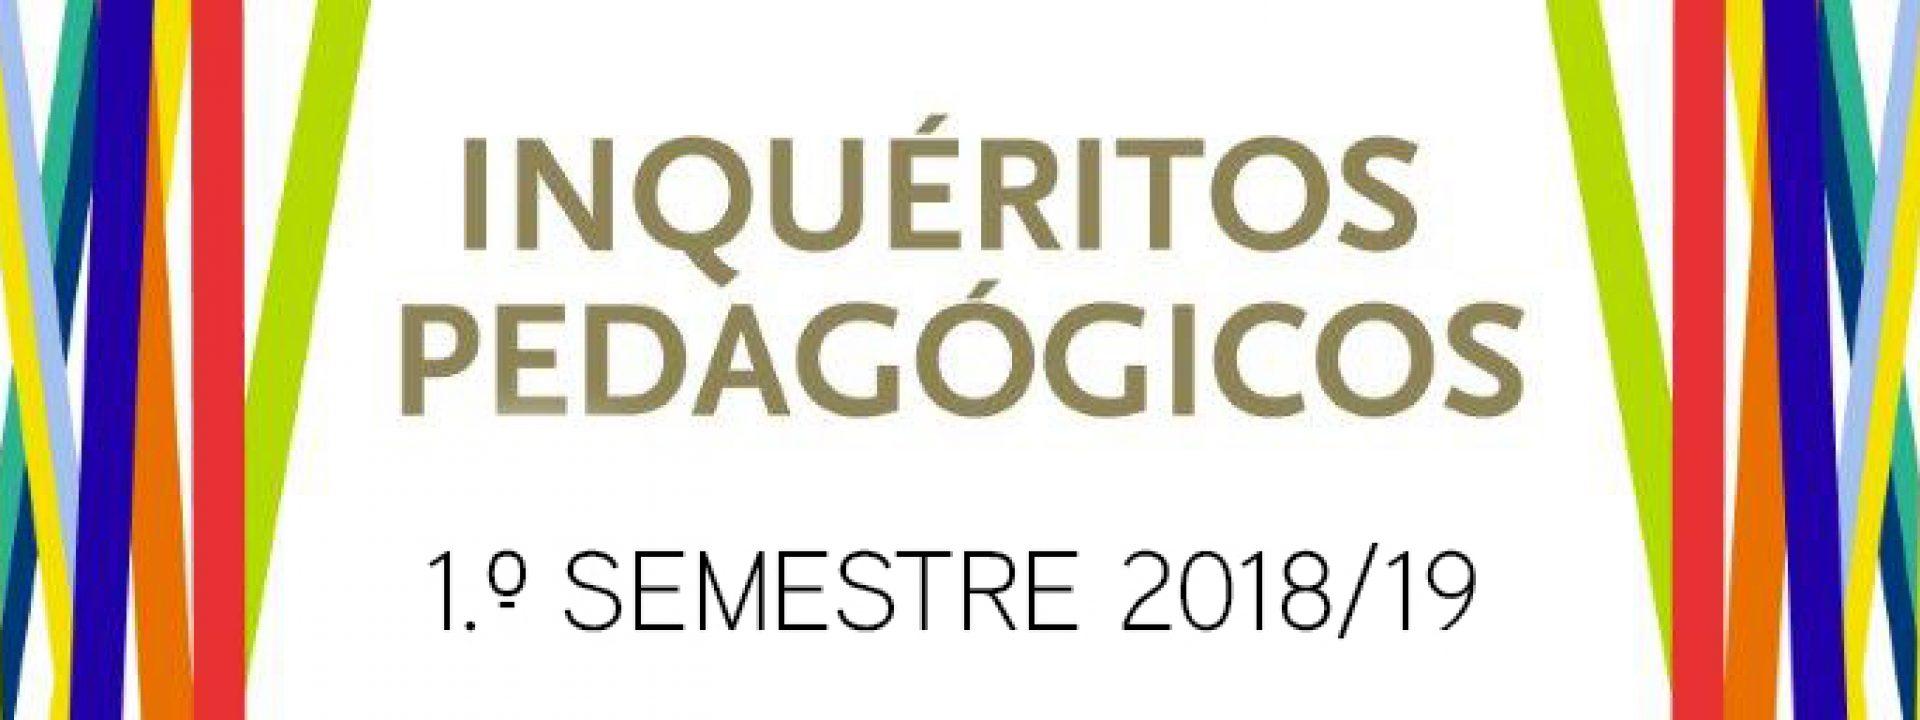 Preenchimento dos IPUPs 1 semestre 2018/2019